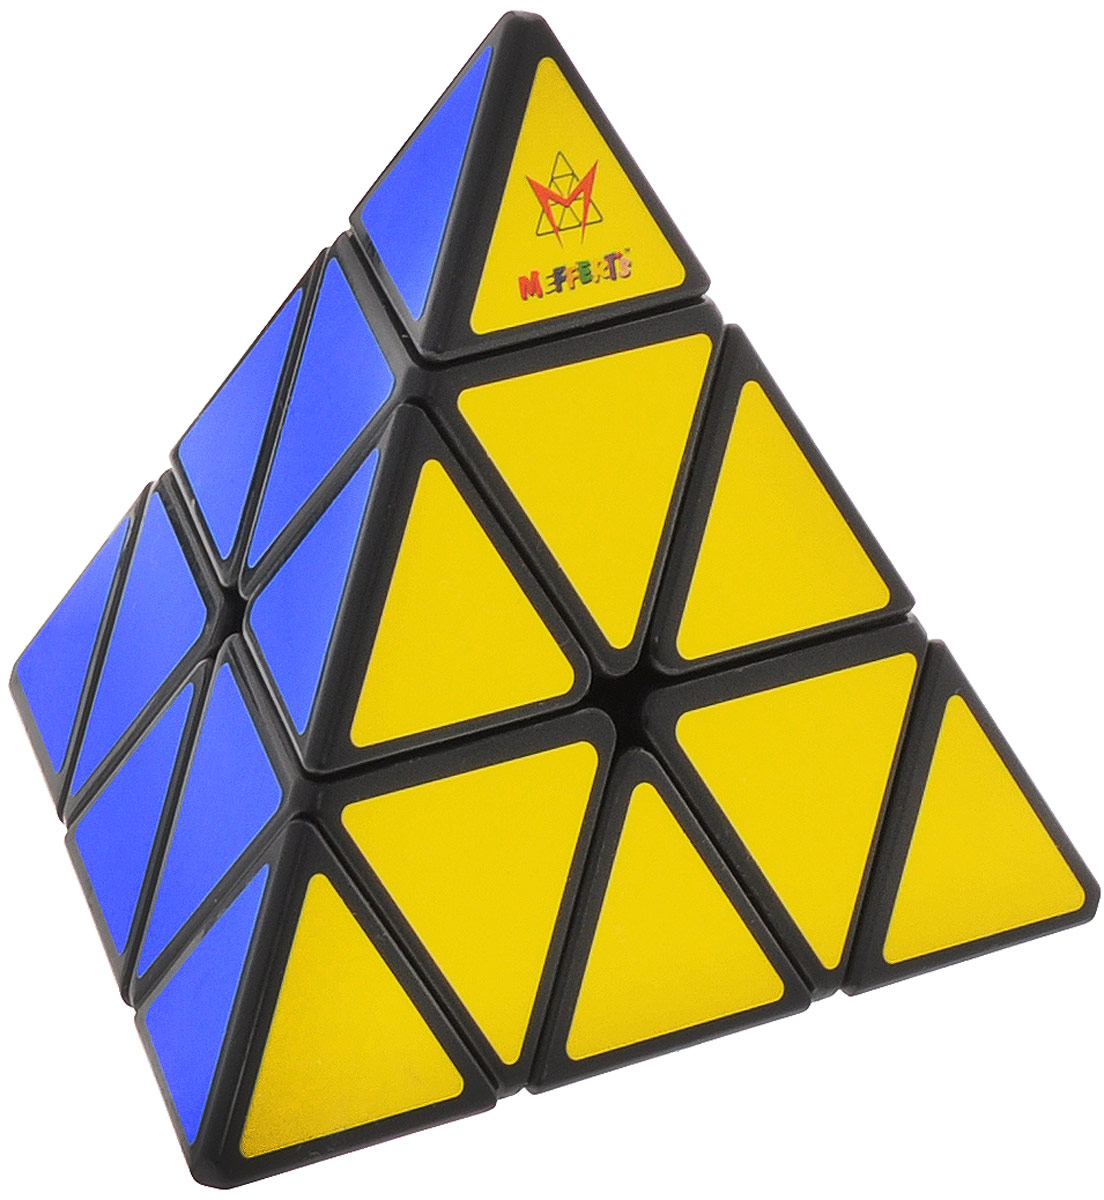 Meffert's Головоломка Пирамидка Pyraminx